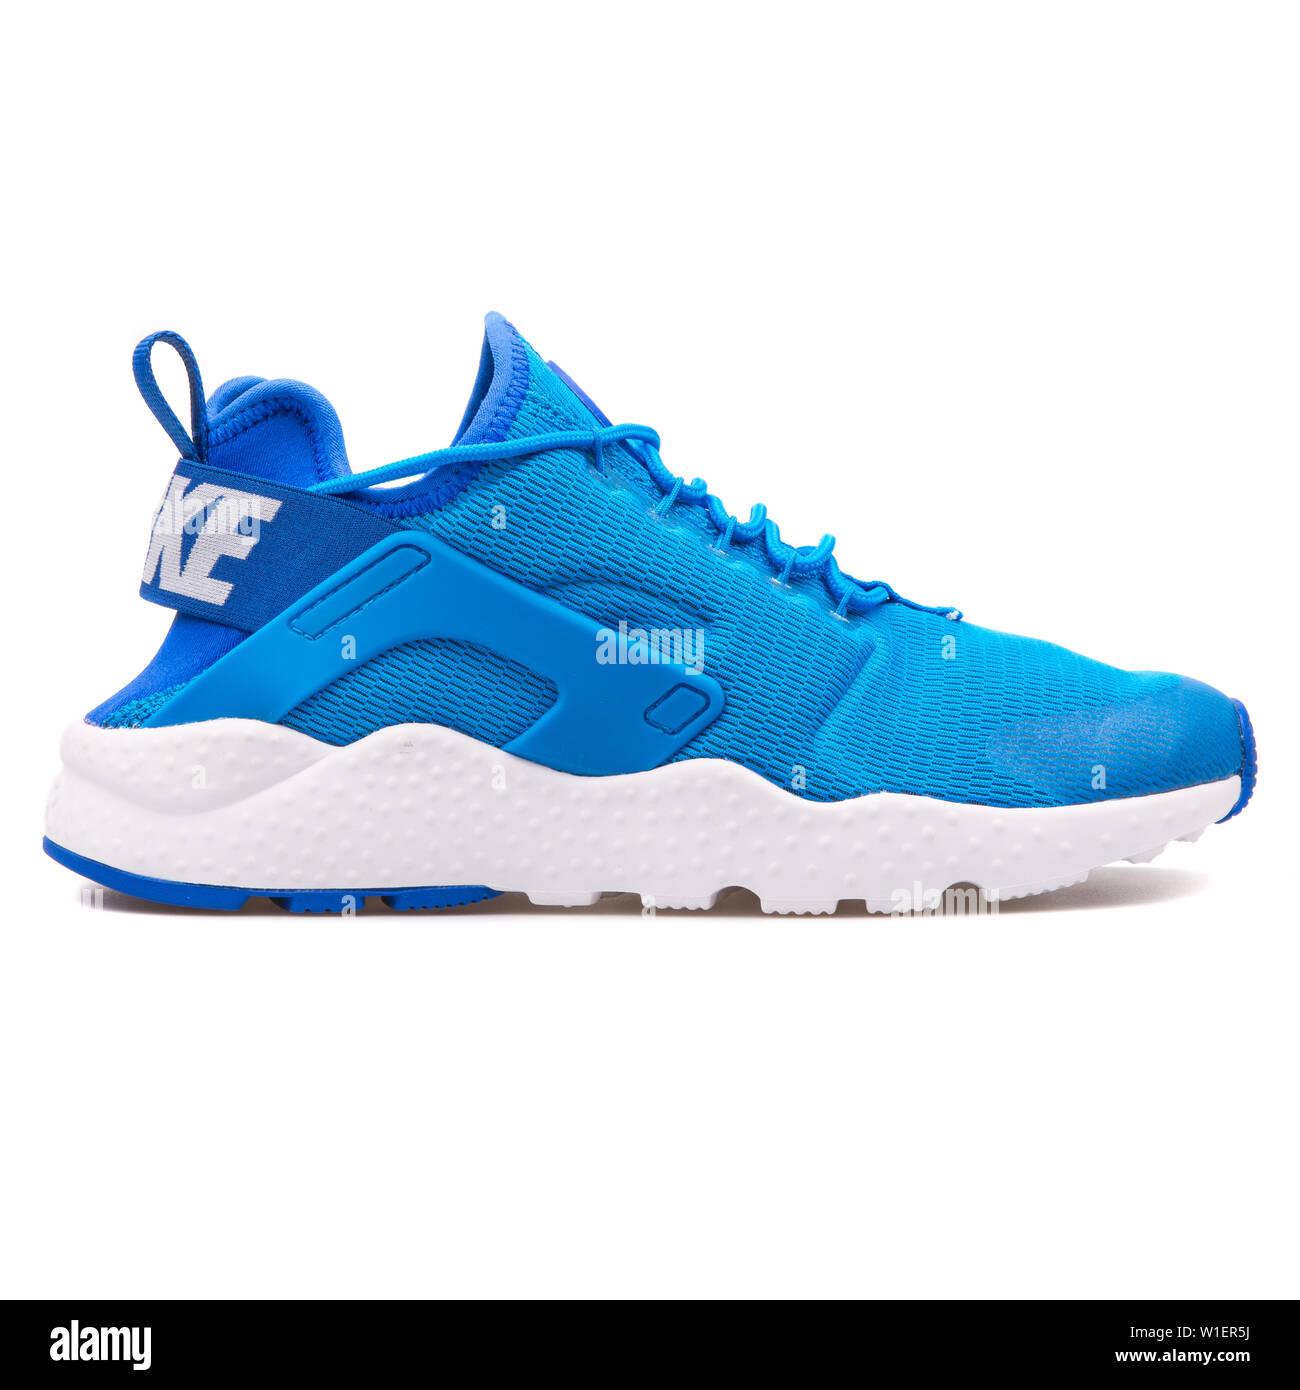 sensor chupar Blanco  VIENNA, AUSTRIA - AUGUST 10, 2017: Nike Air Huarache Run Ultra blue and  white sneaker on white background Stock Photo - Alamy